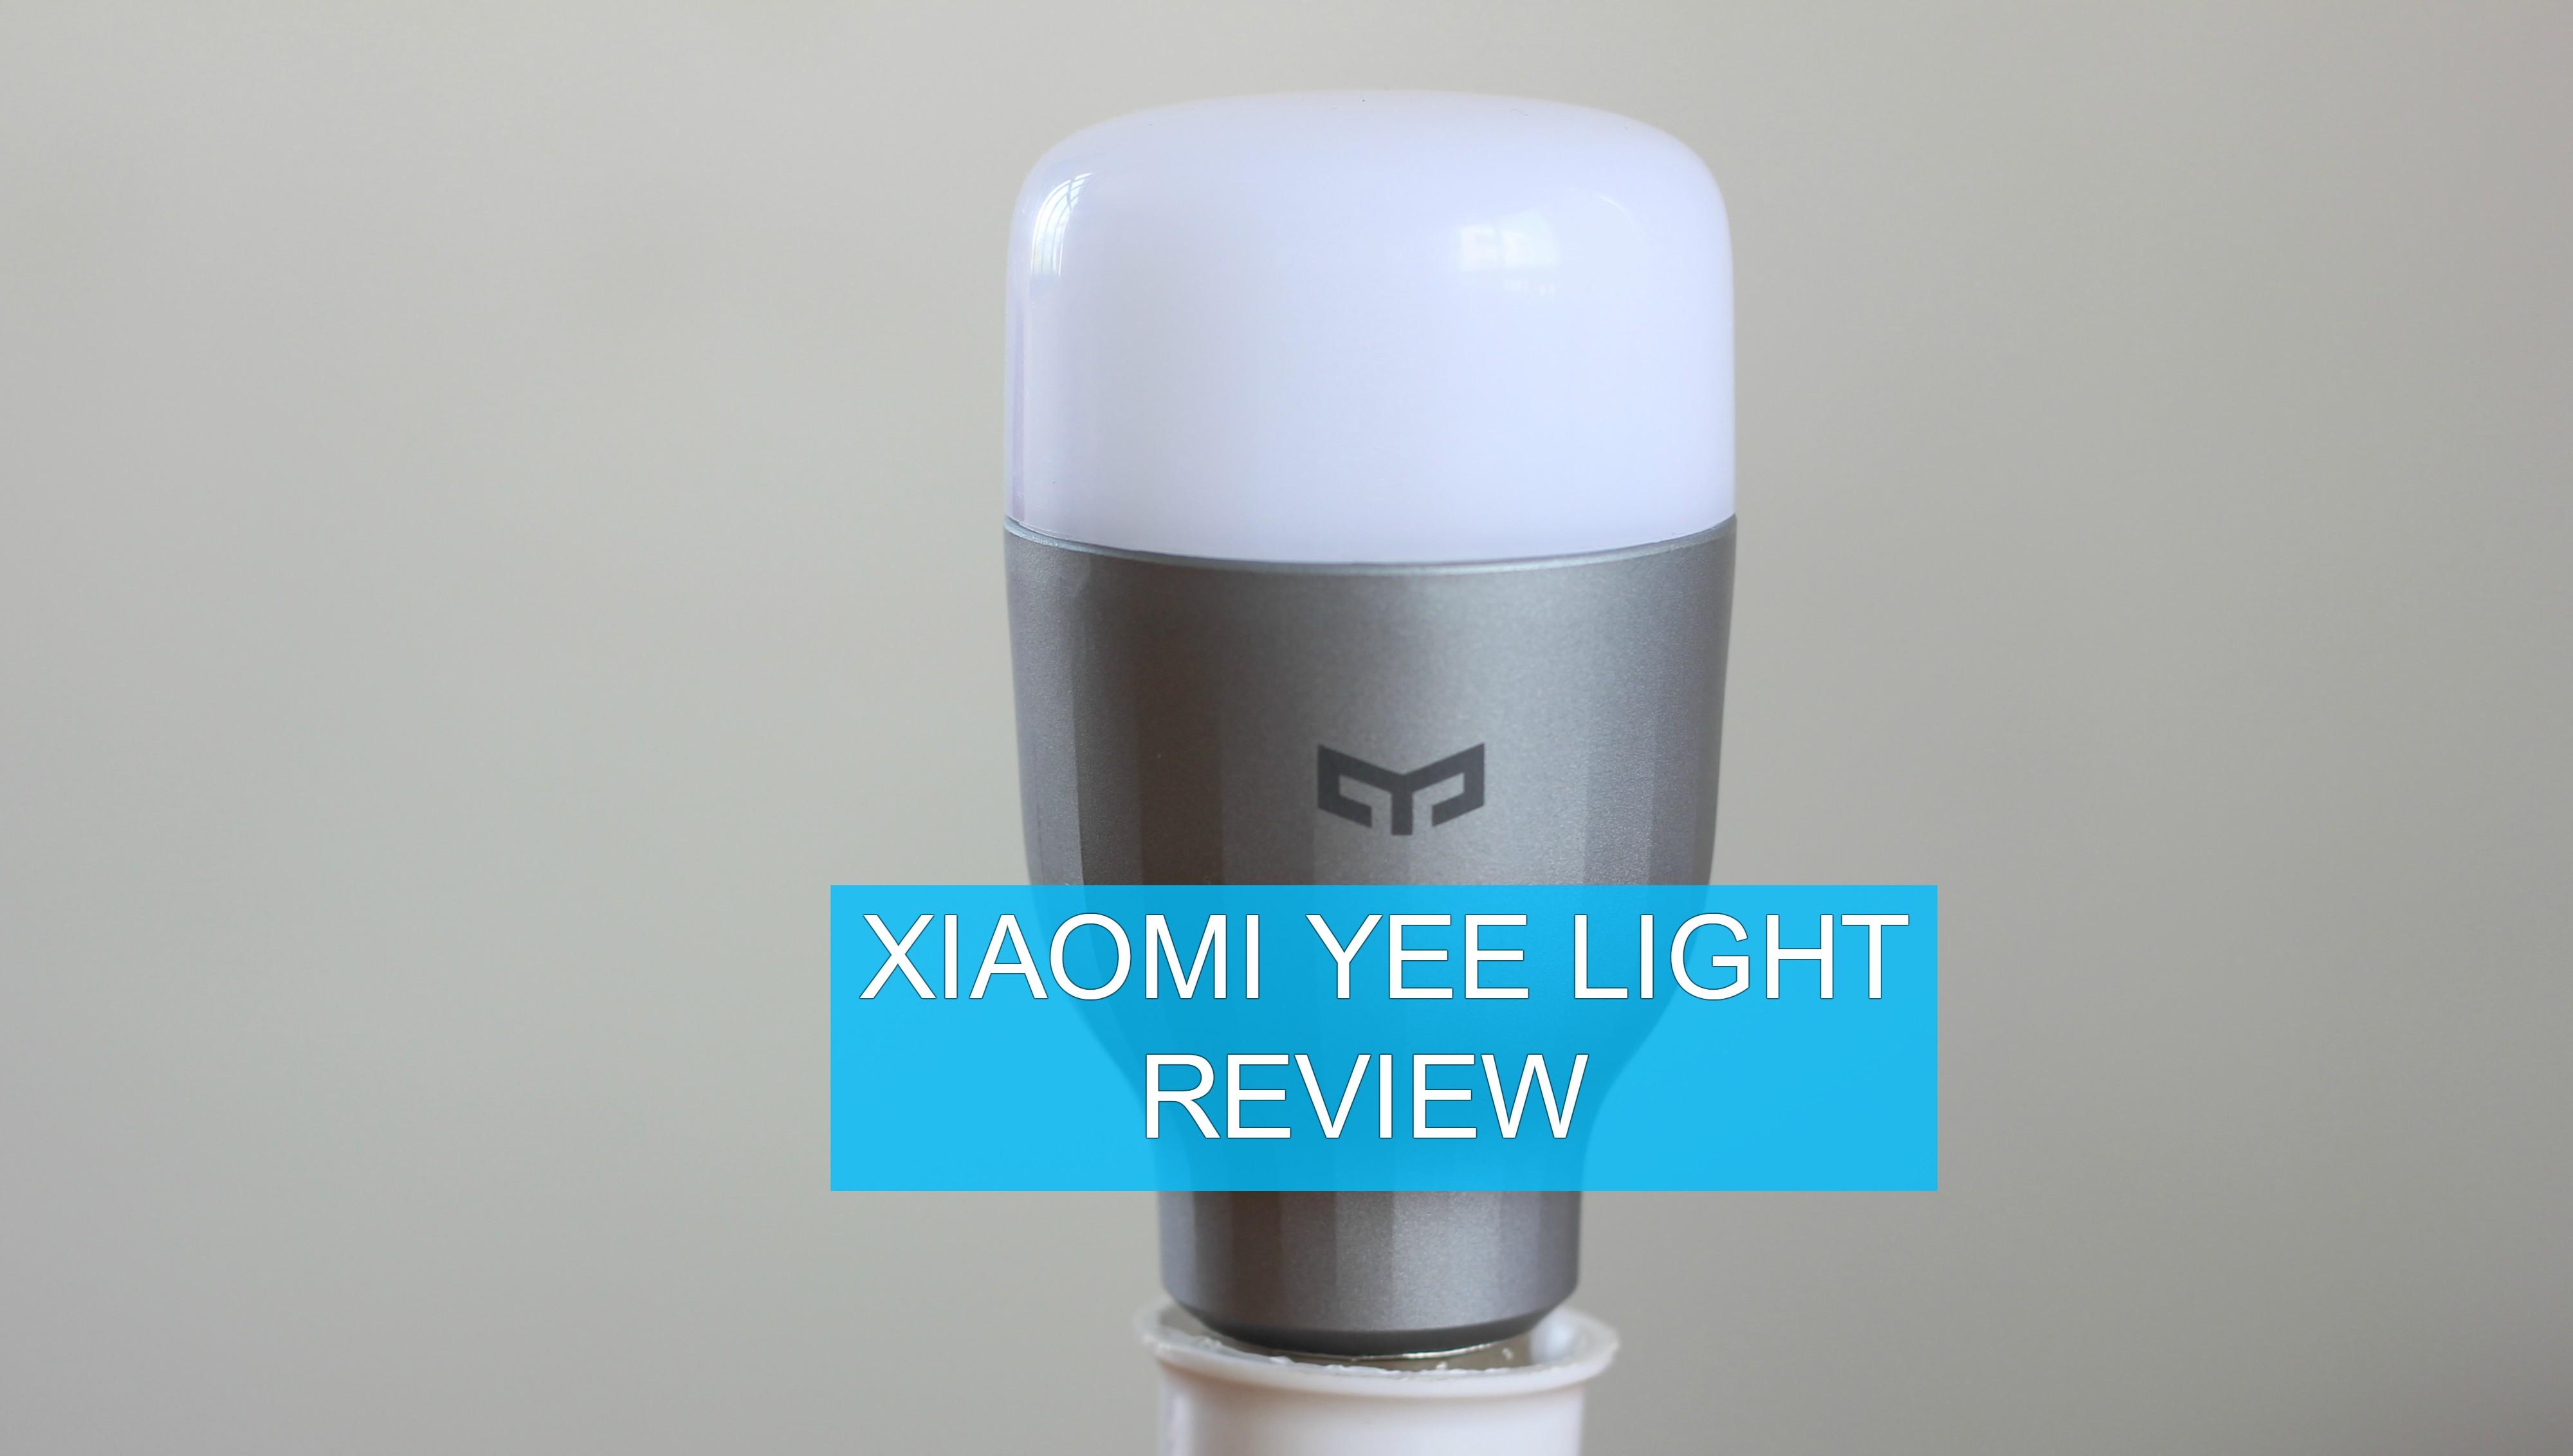 Xiaomi Yeelight Review Giveaway A Smart Led Bulb That Won 39 T 39 Break Your Bank Gadgetbyte Nepal